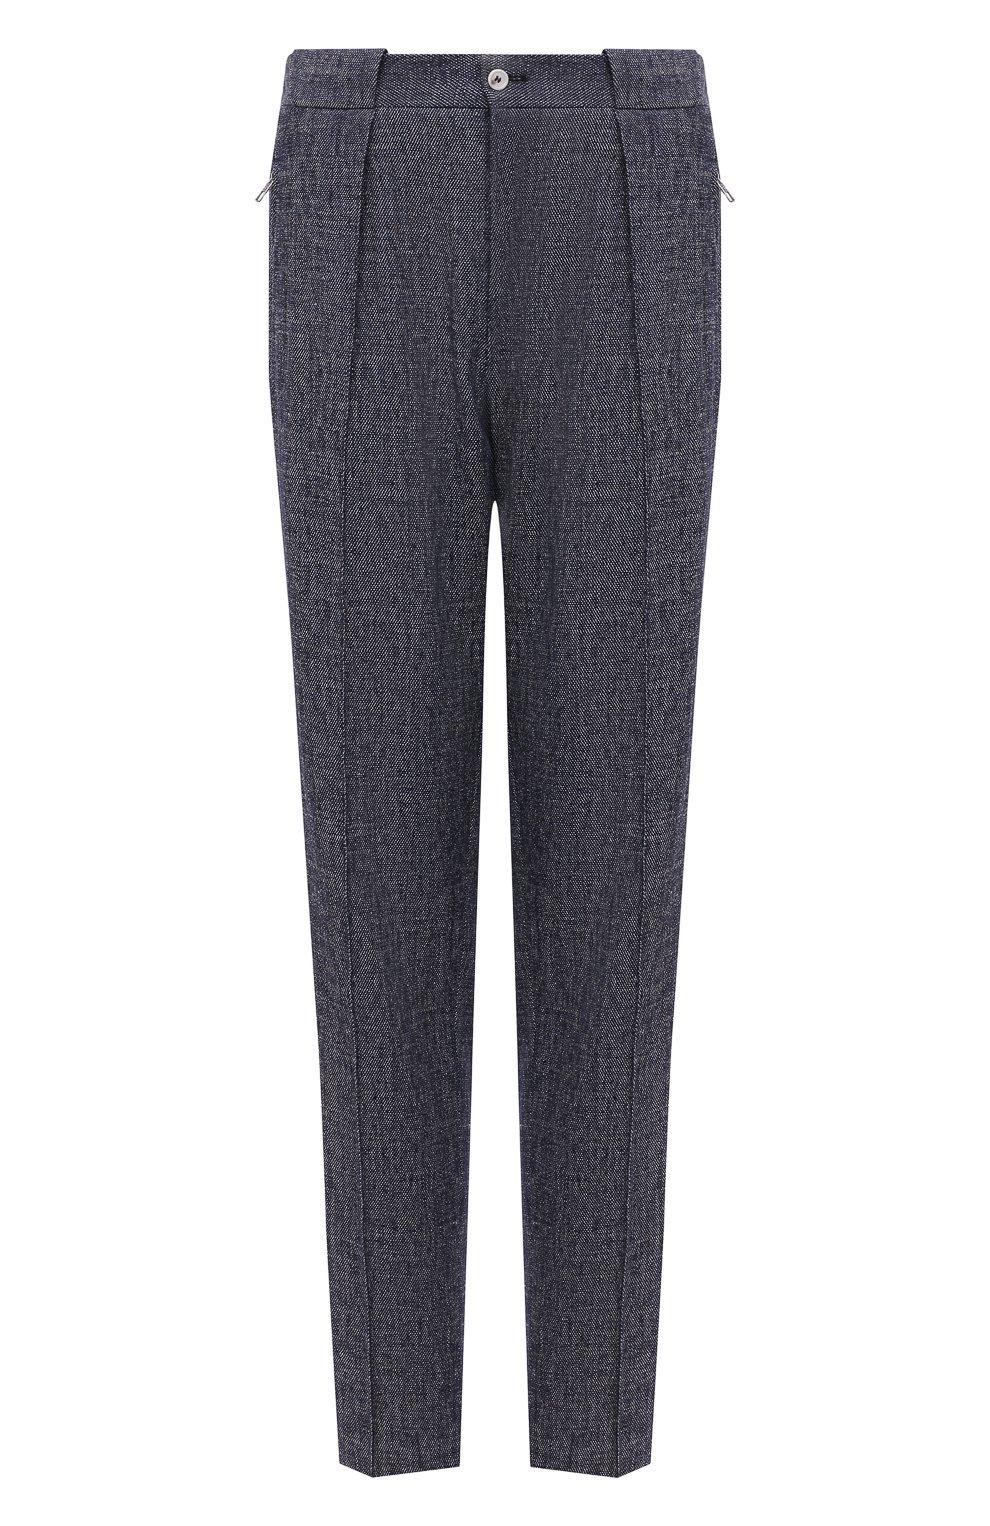 Мужские брюки изо льна и хлопка GIORGIO ARMANI синего цвета, арт. 1SGPP0GM/T02CB   Фото 1